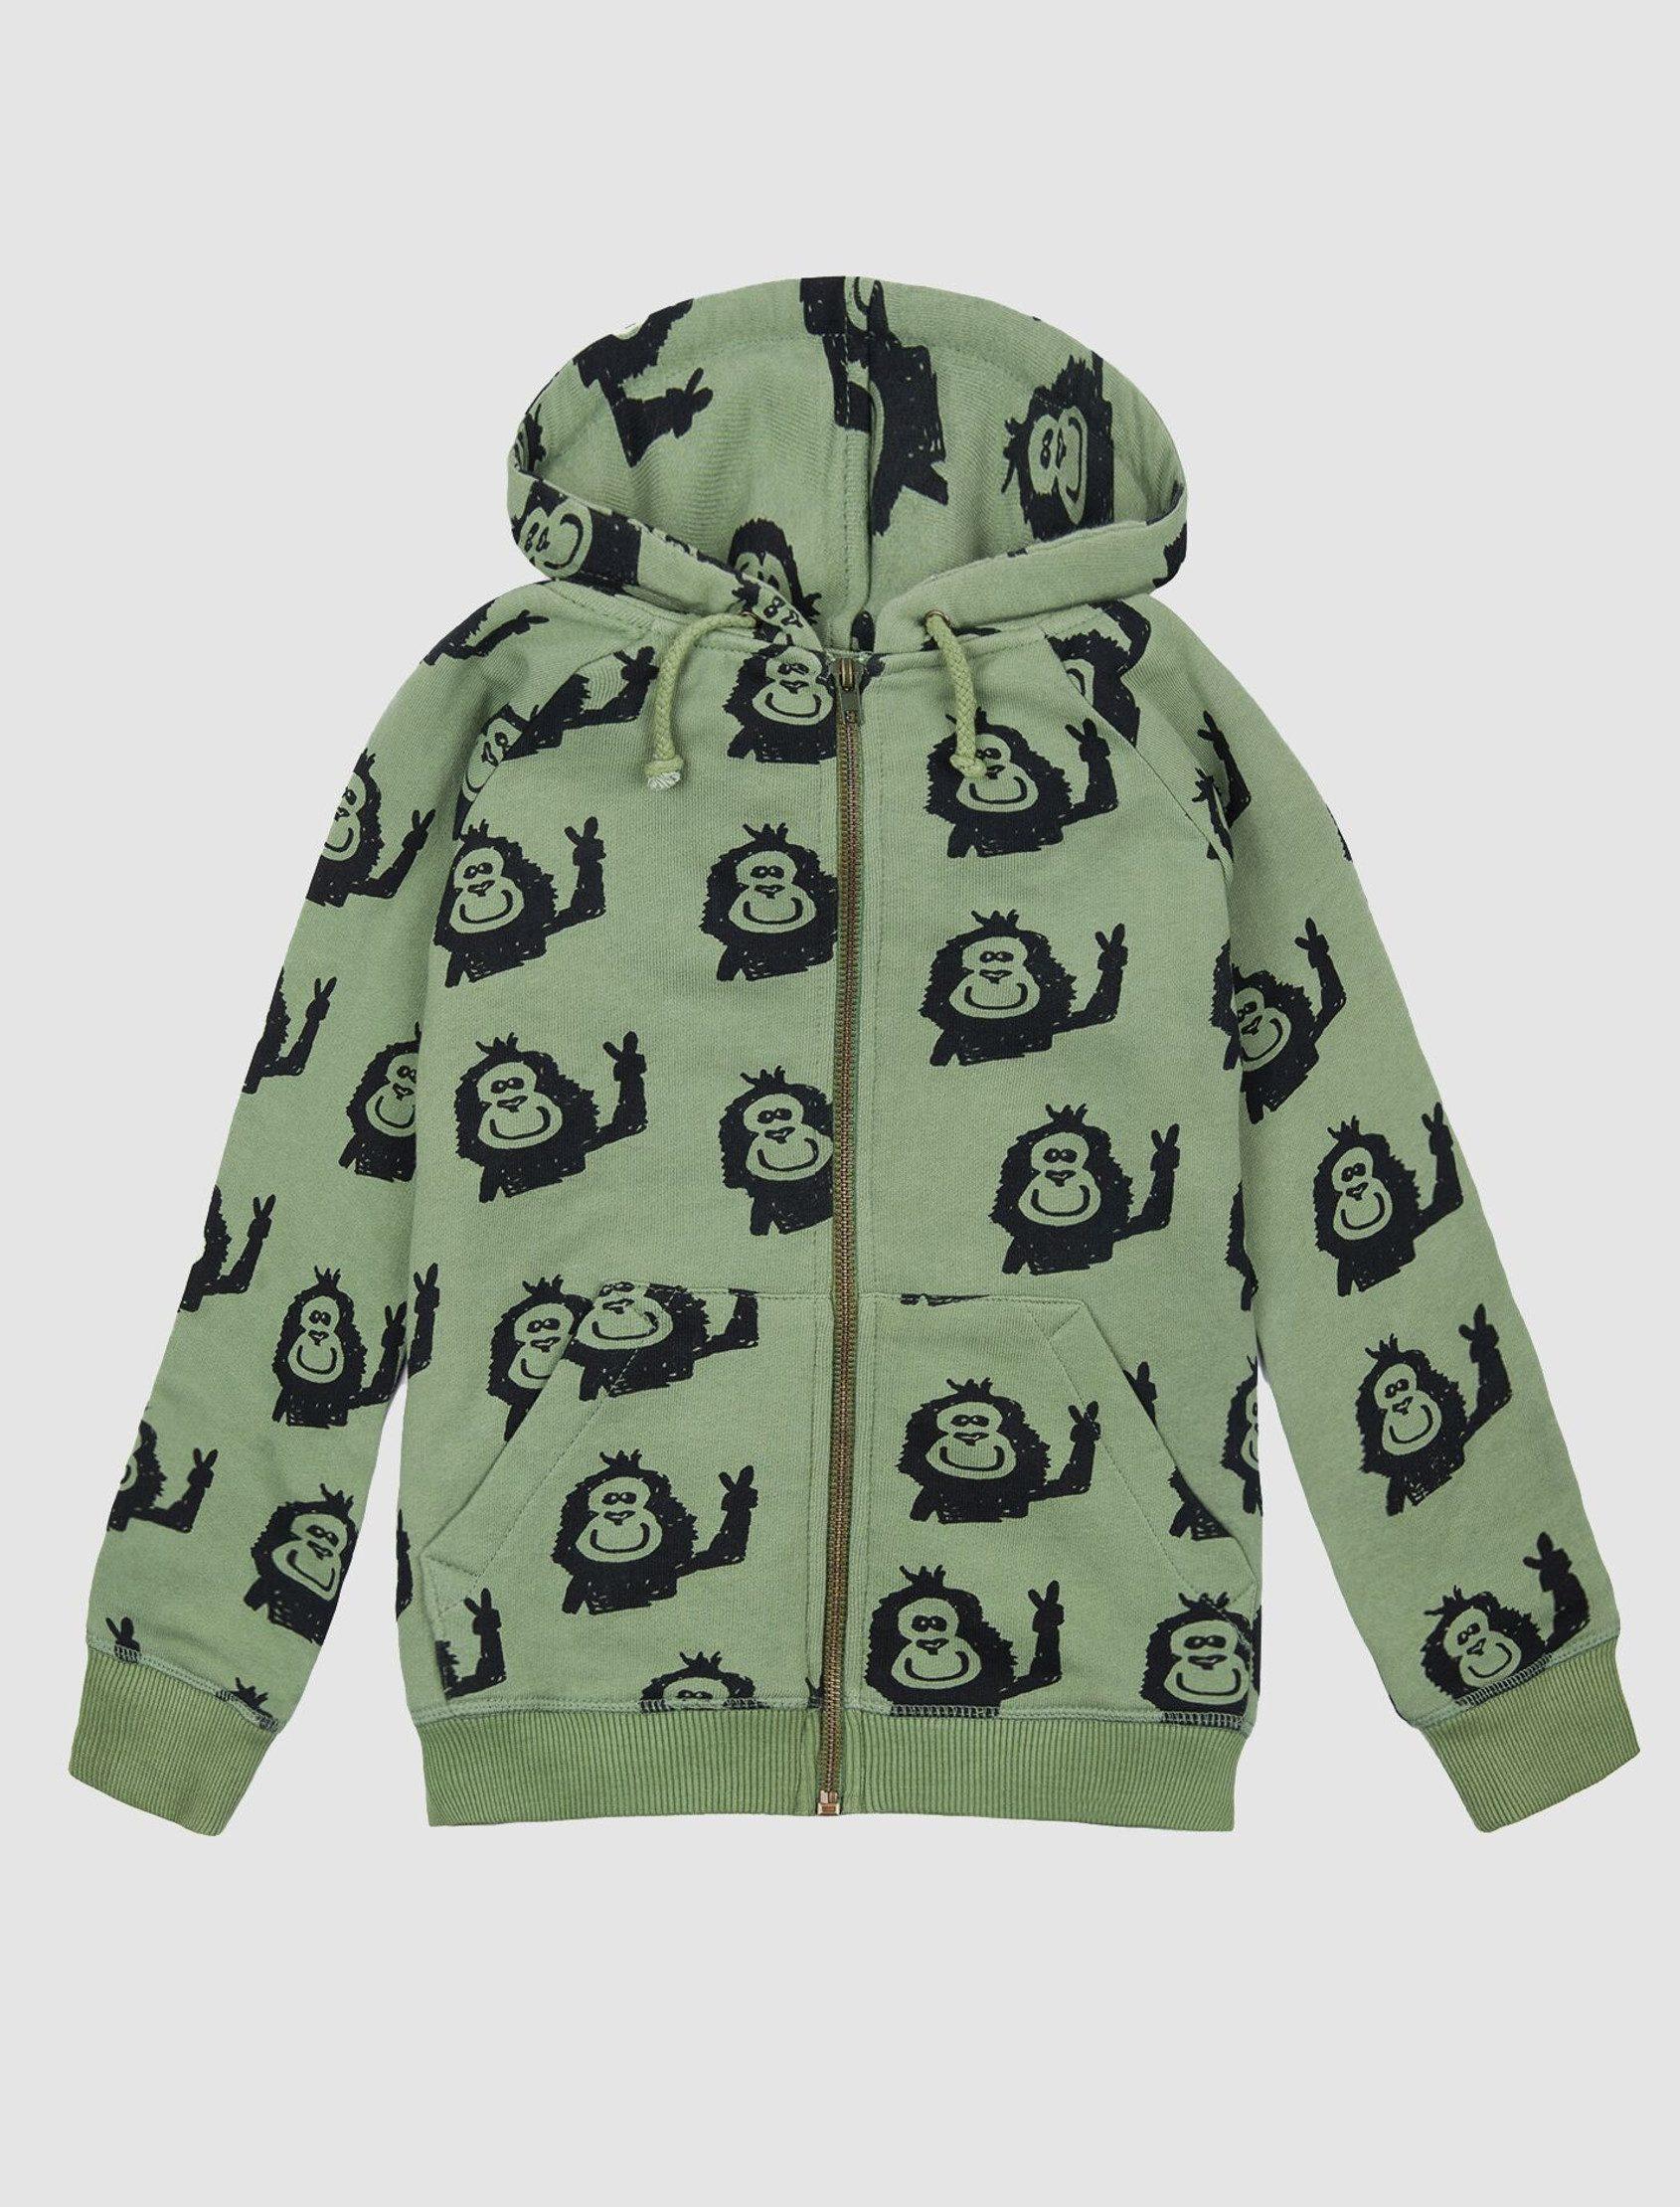 Chaqueta tipo sudadera con capucha, bolsillo canguro y estampado Kapi de Nadadelazos colección ss20.